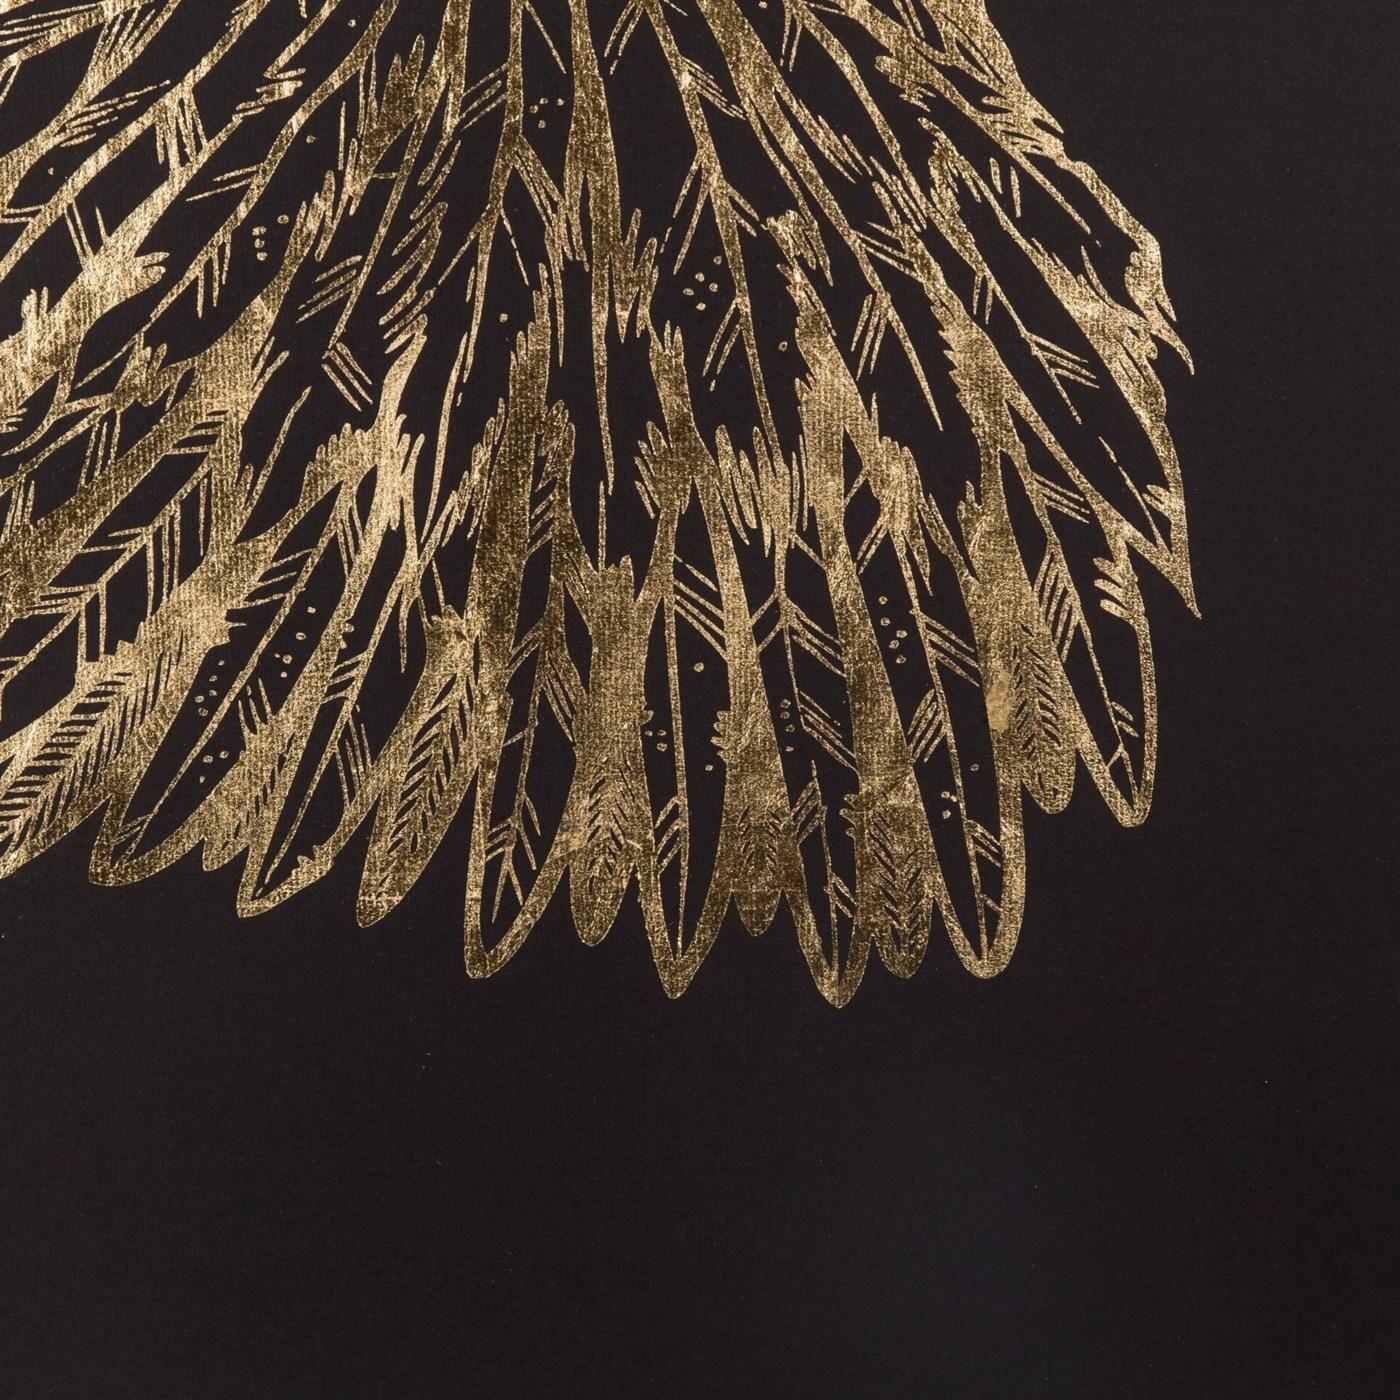 Gold Wings - Black